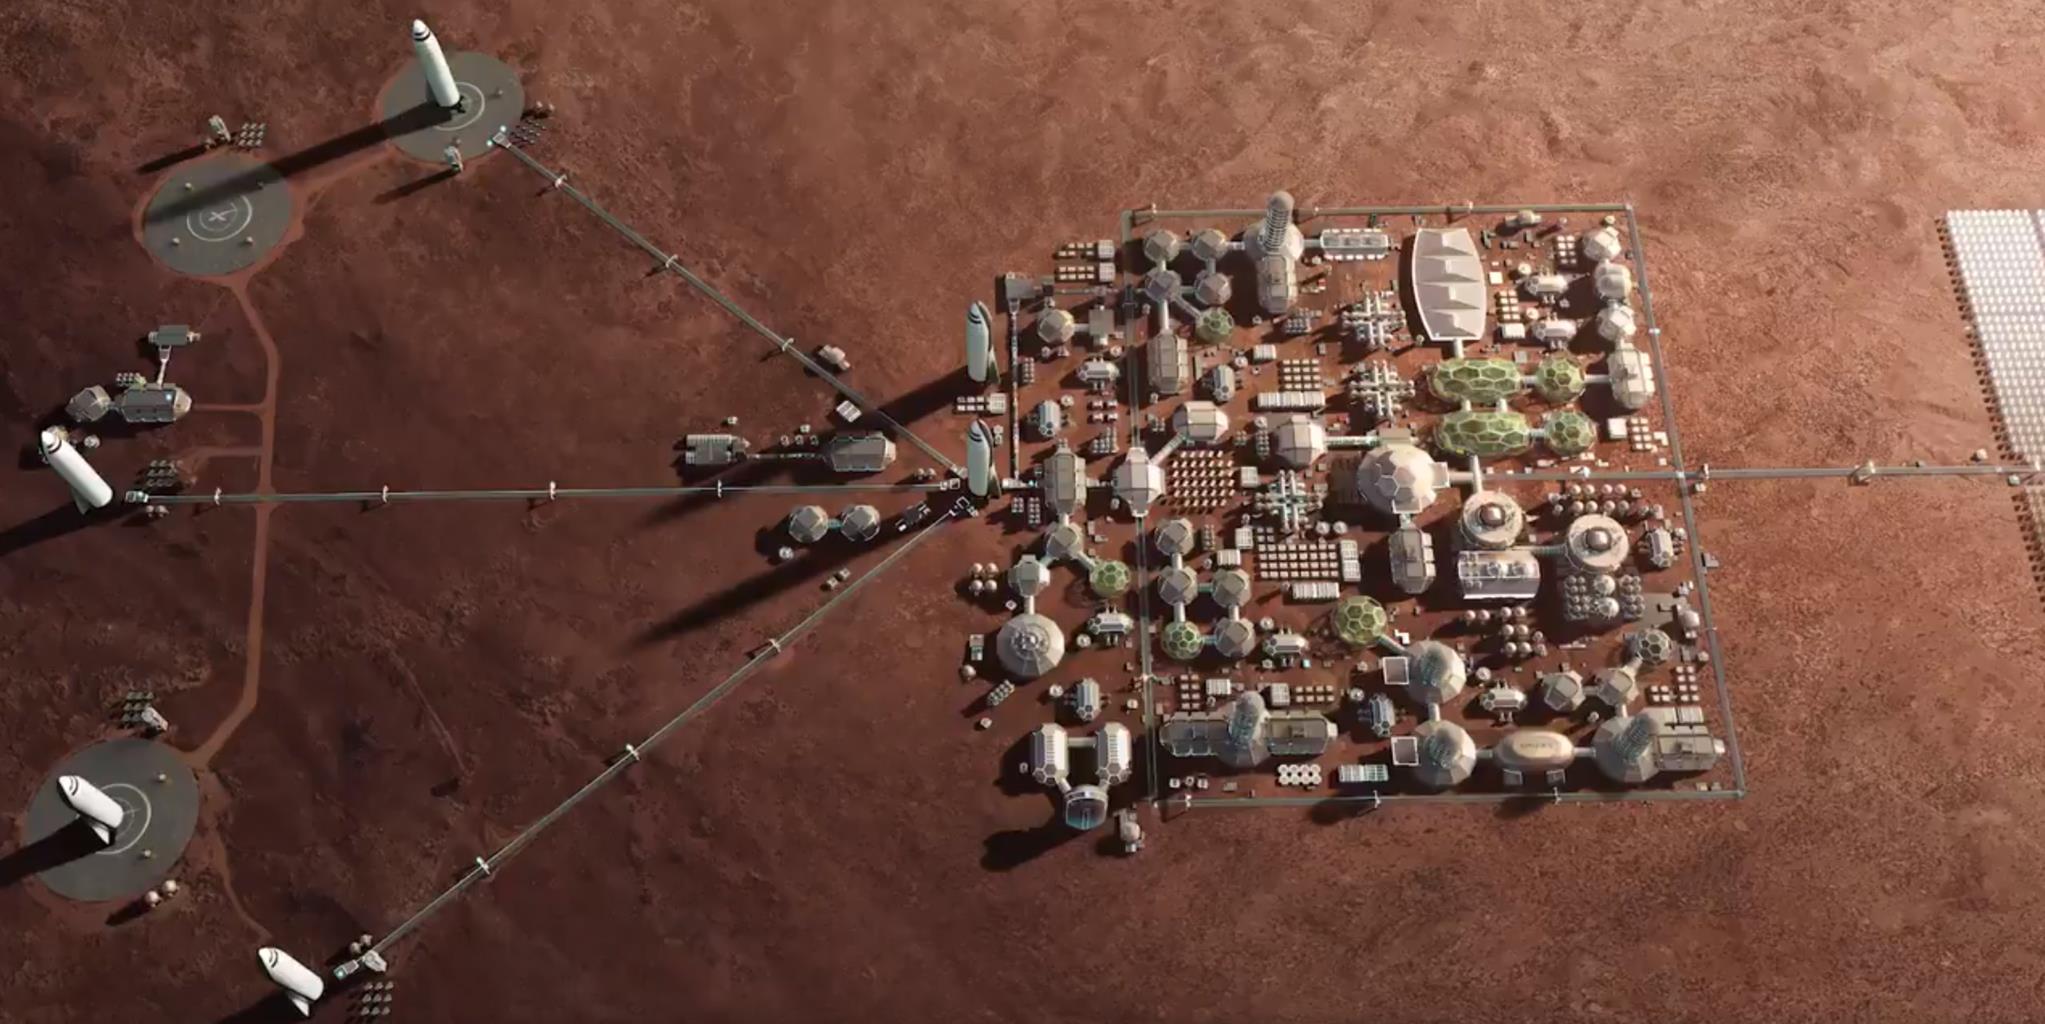 I BFR porteranno gli umani su Marte